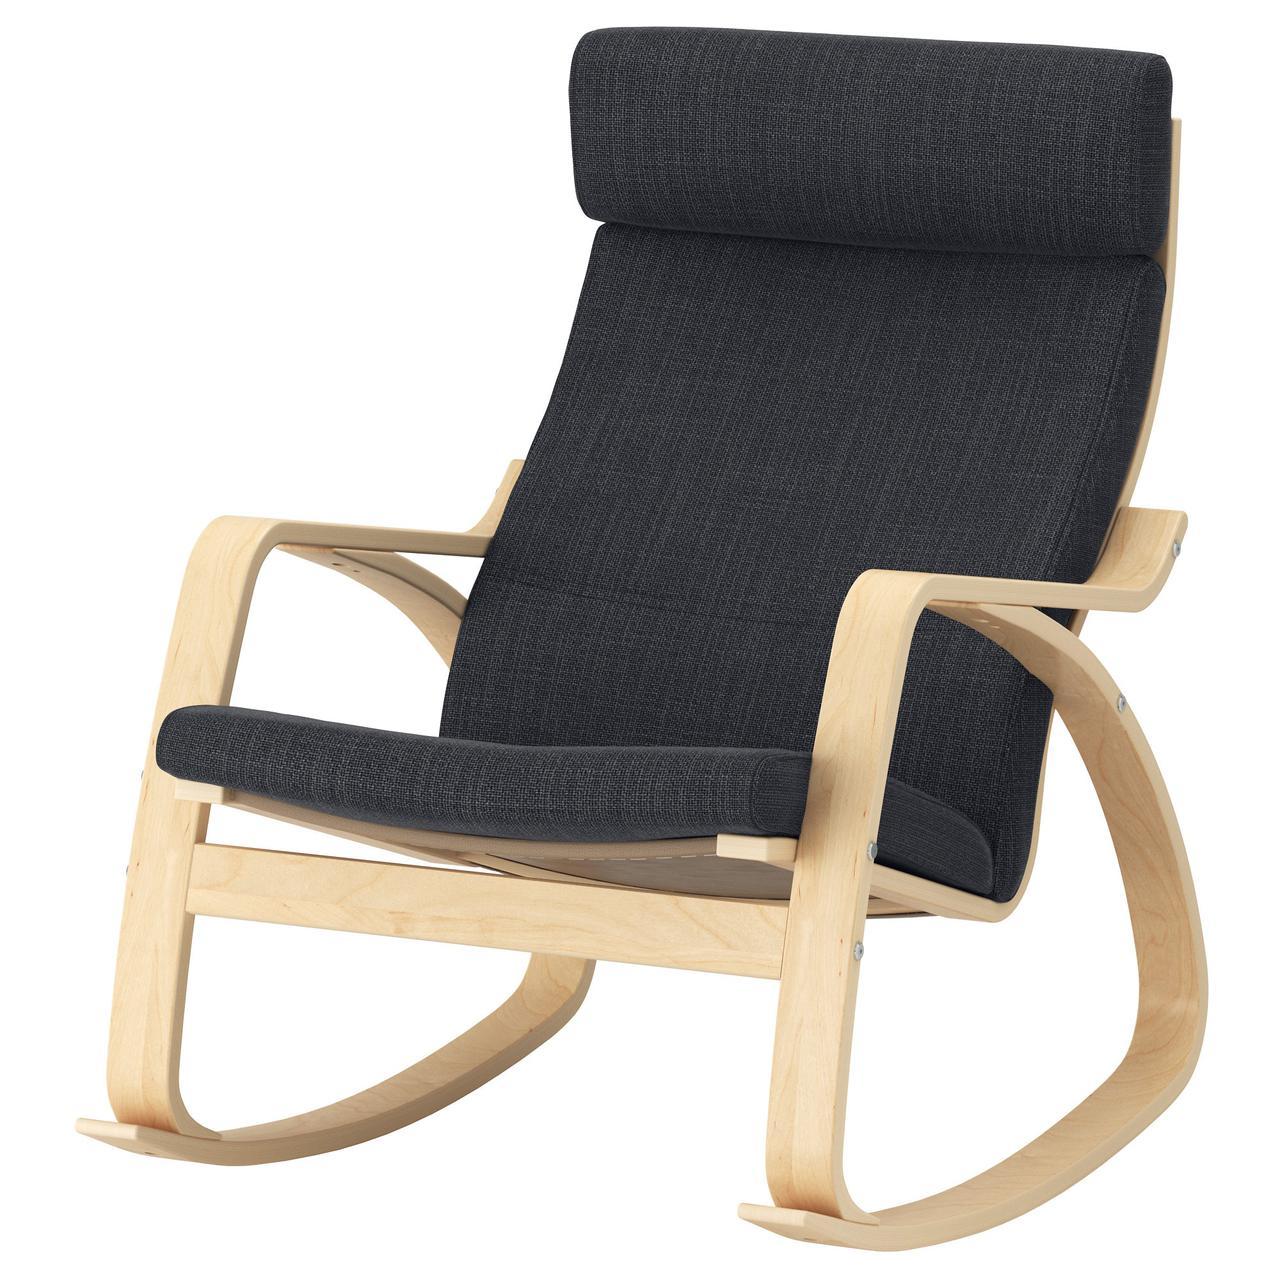 IKEA POANG (392.010.26) Хитний стілець